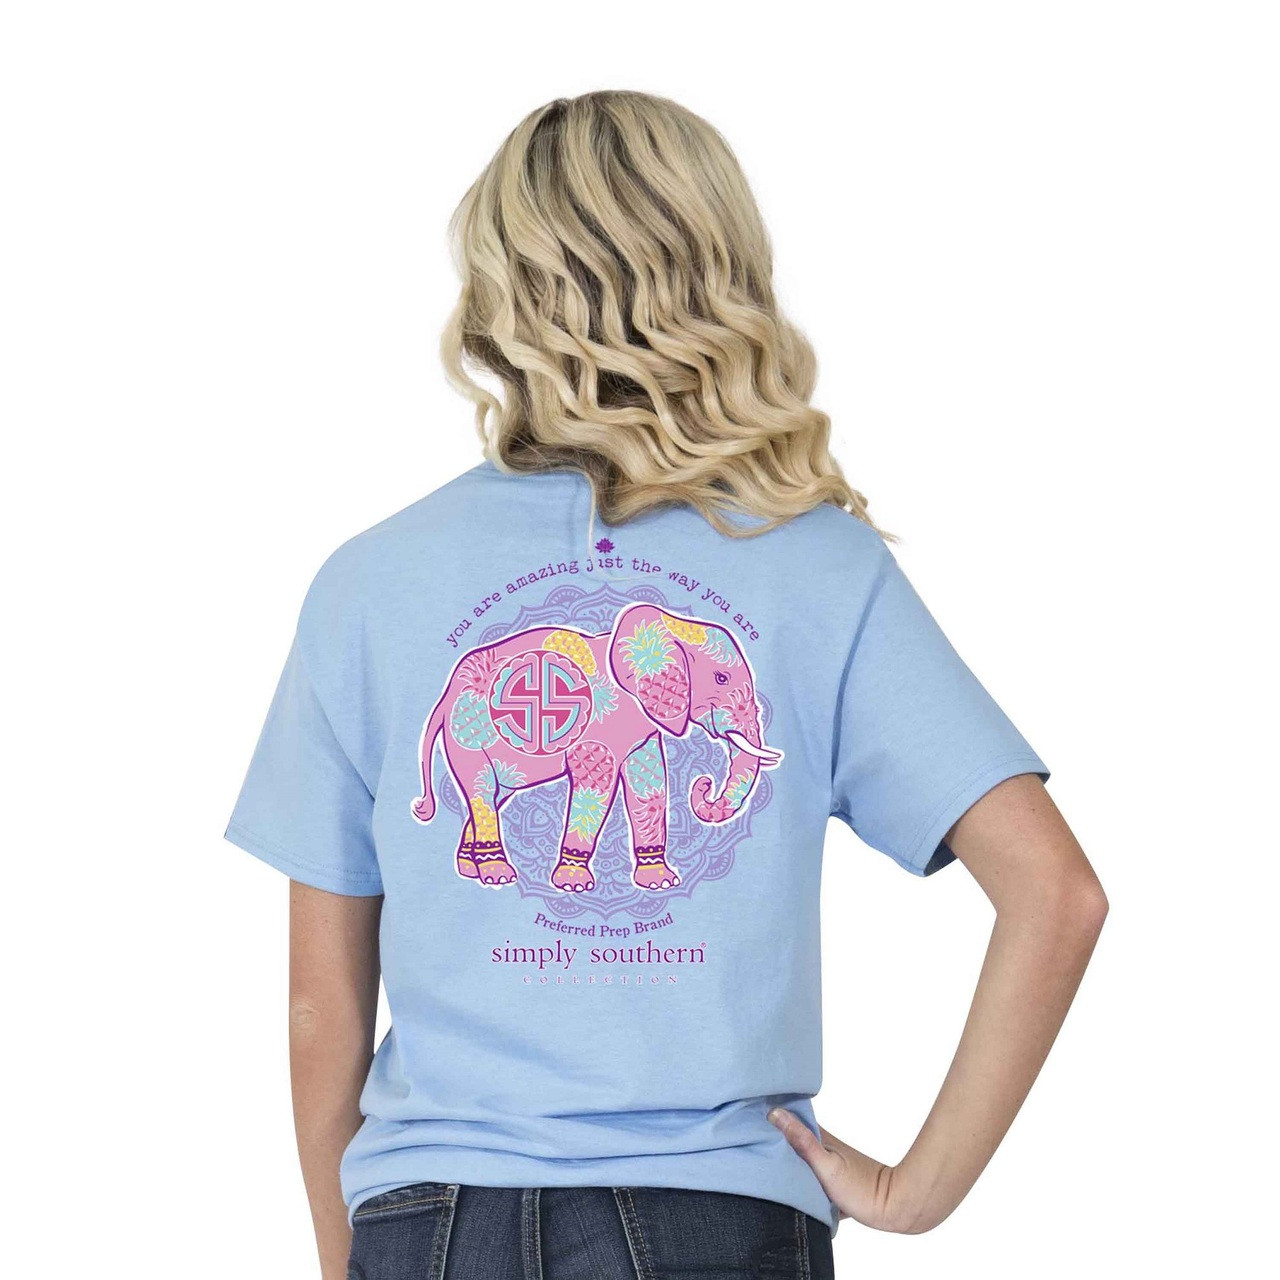 4c9e93c5c4609 You Are Amazing Elephant Pineapple Simply Southern Tee Shirt ...